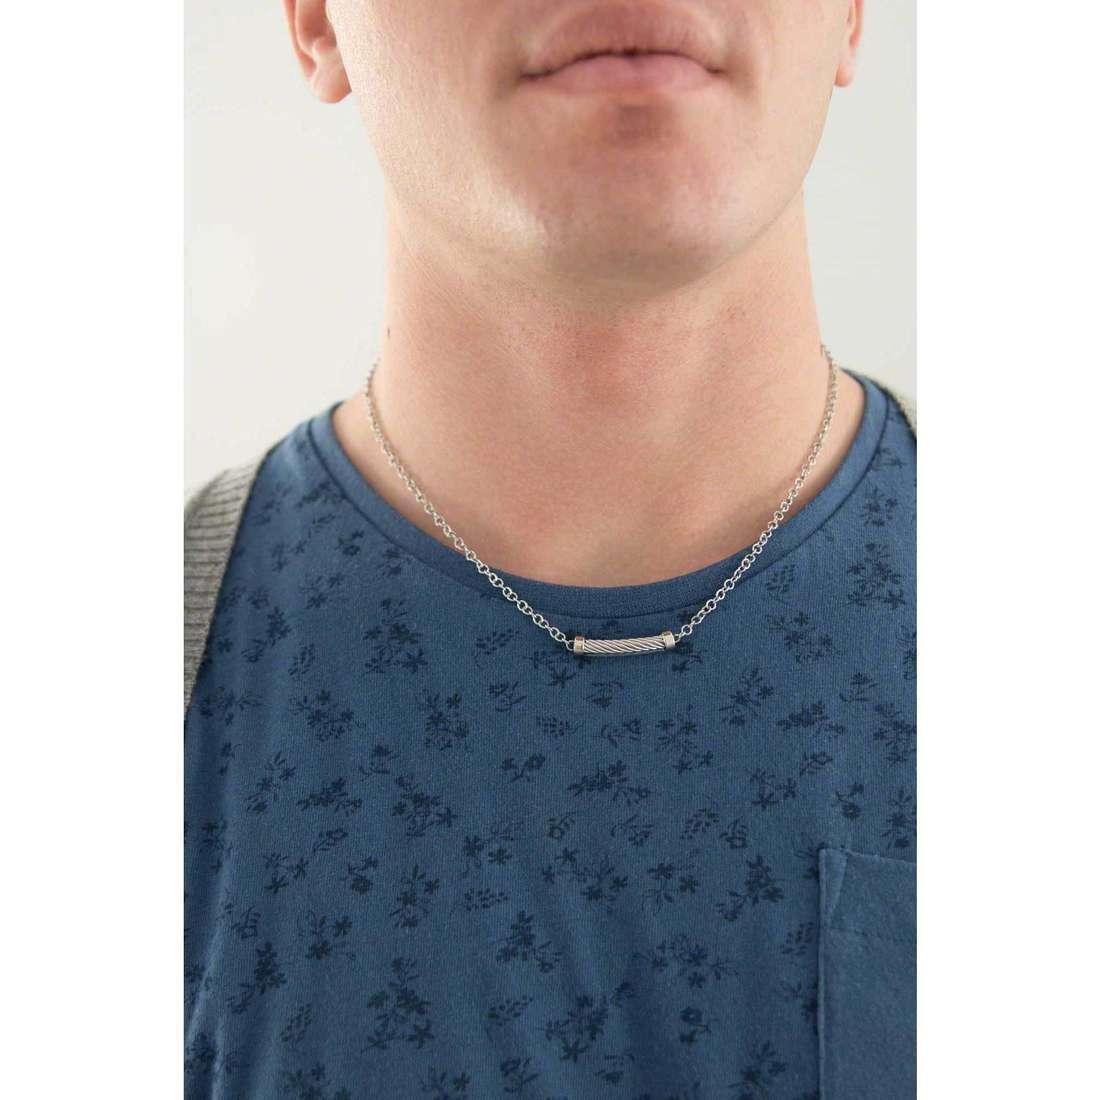 Sagapò colliers Pole homme SAGAPOSPO01 indosso